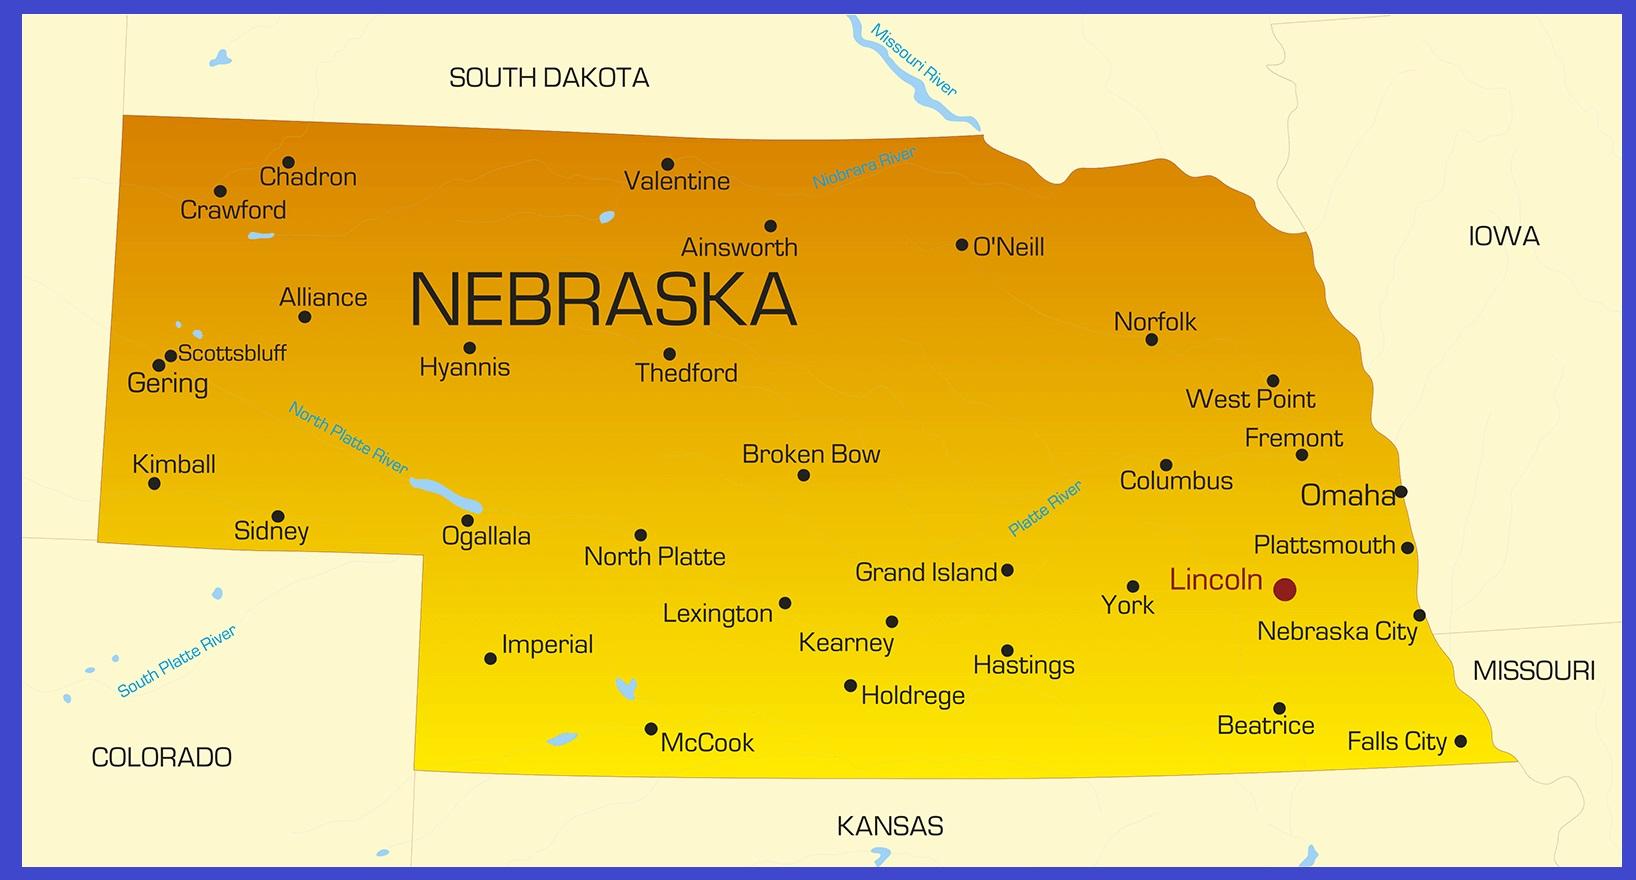 Nebraska Details Map | Large Printable High Resolution and Standard Map